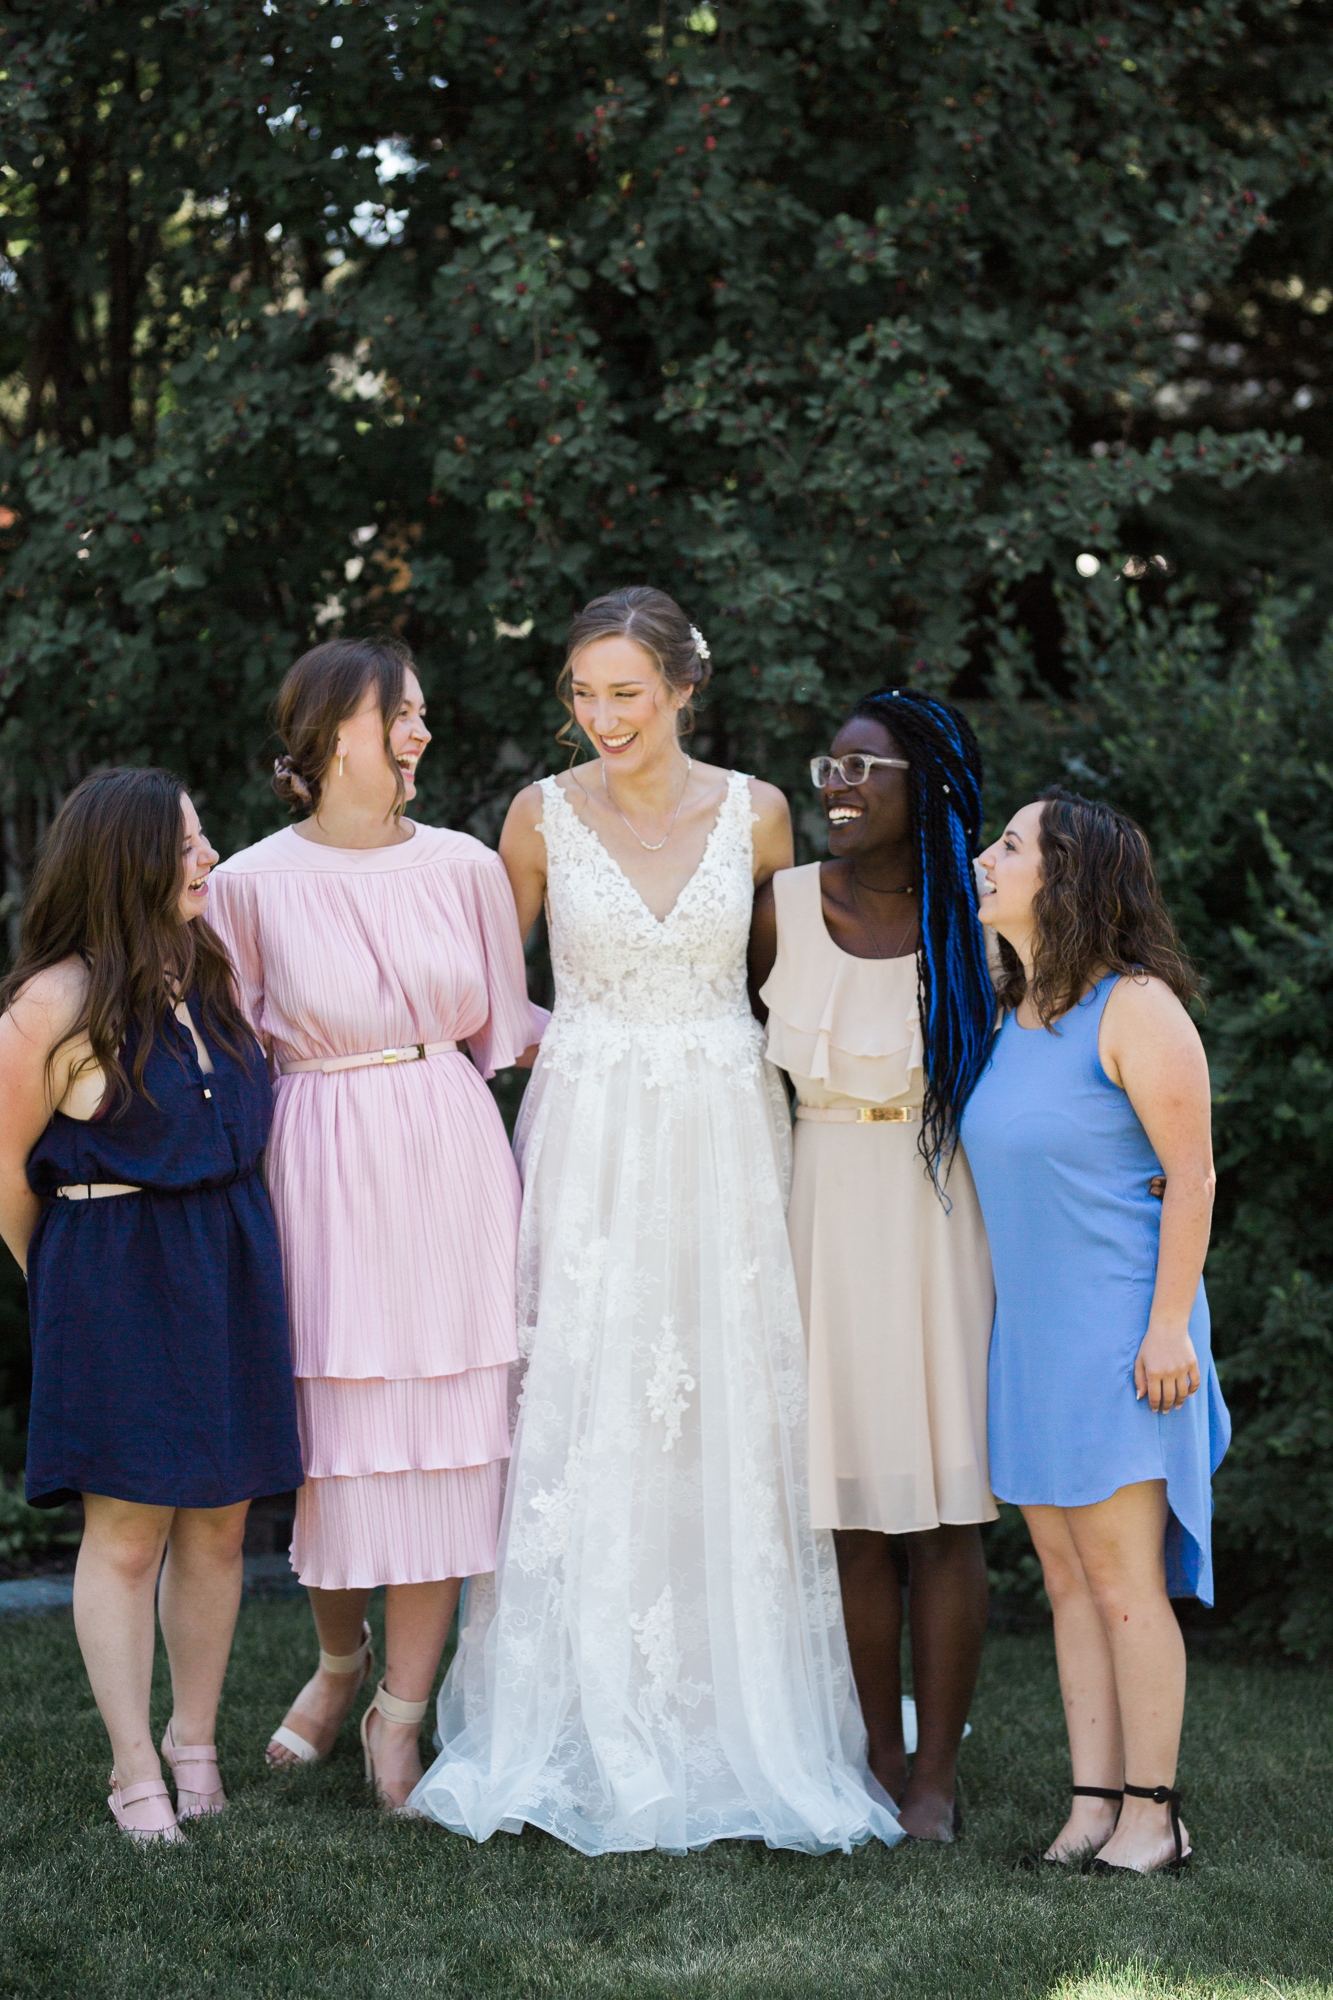 Calgary-wedding-photographer-NN-18.jpg